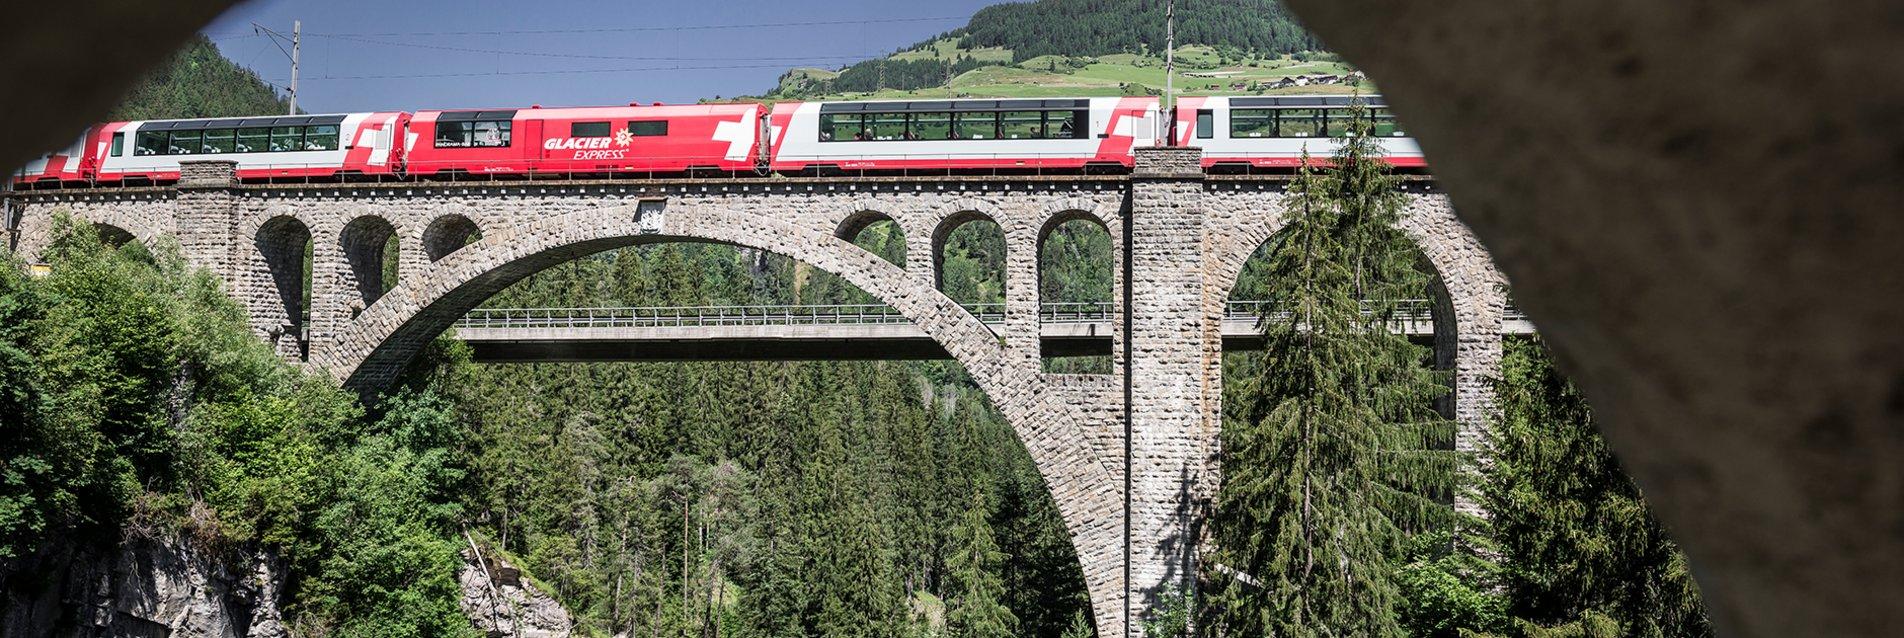 Glacier Express RhB